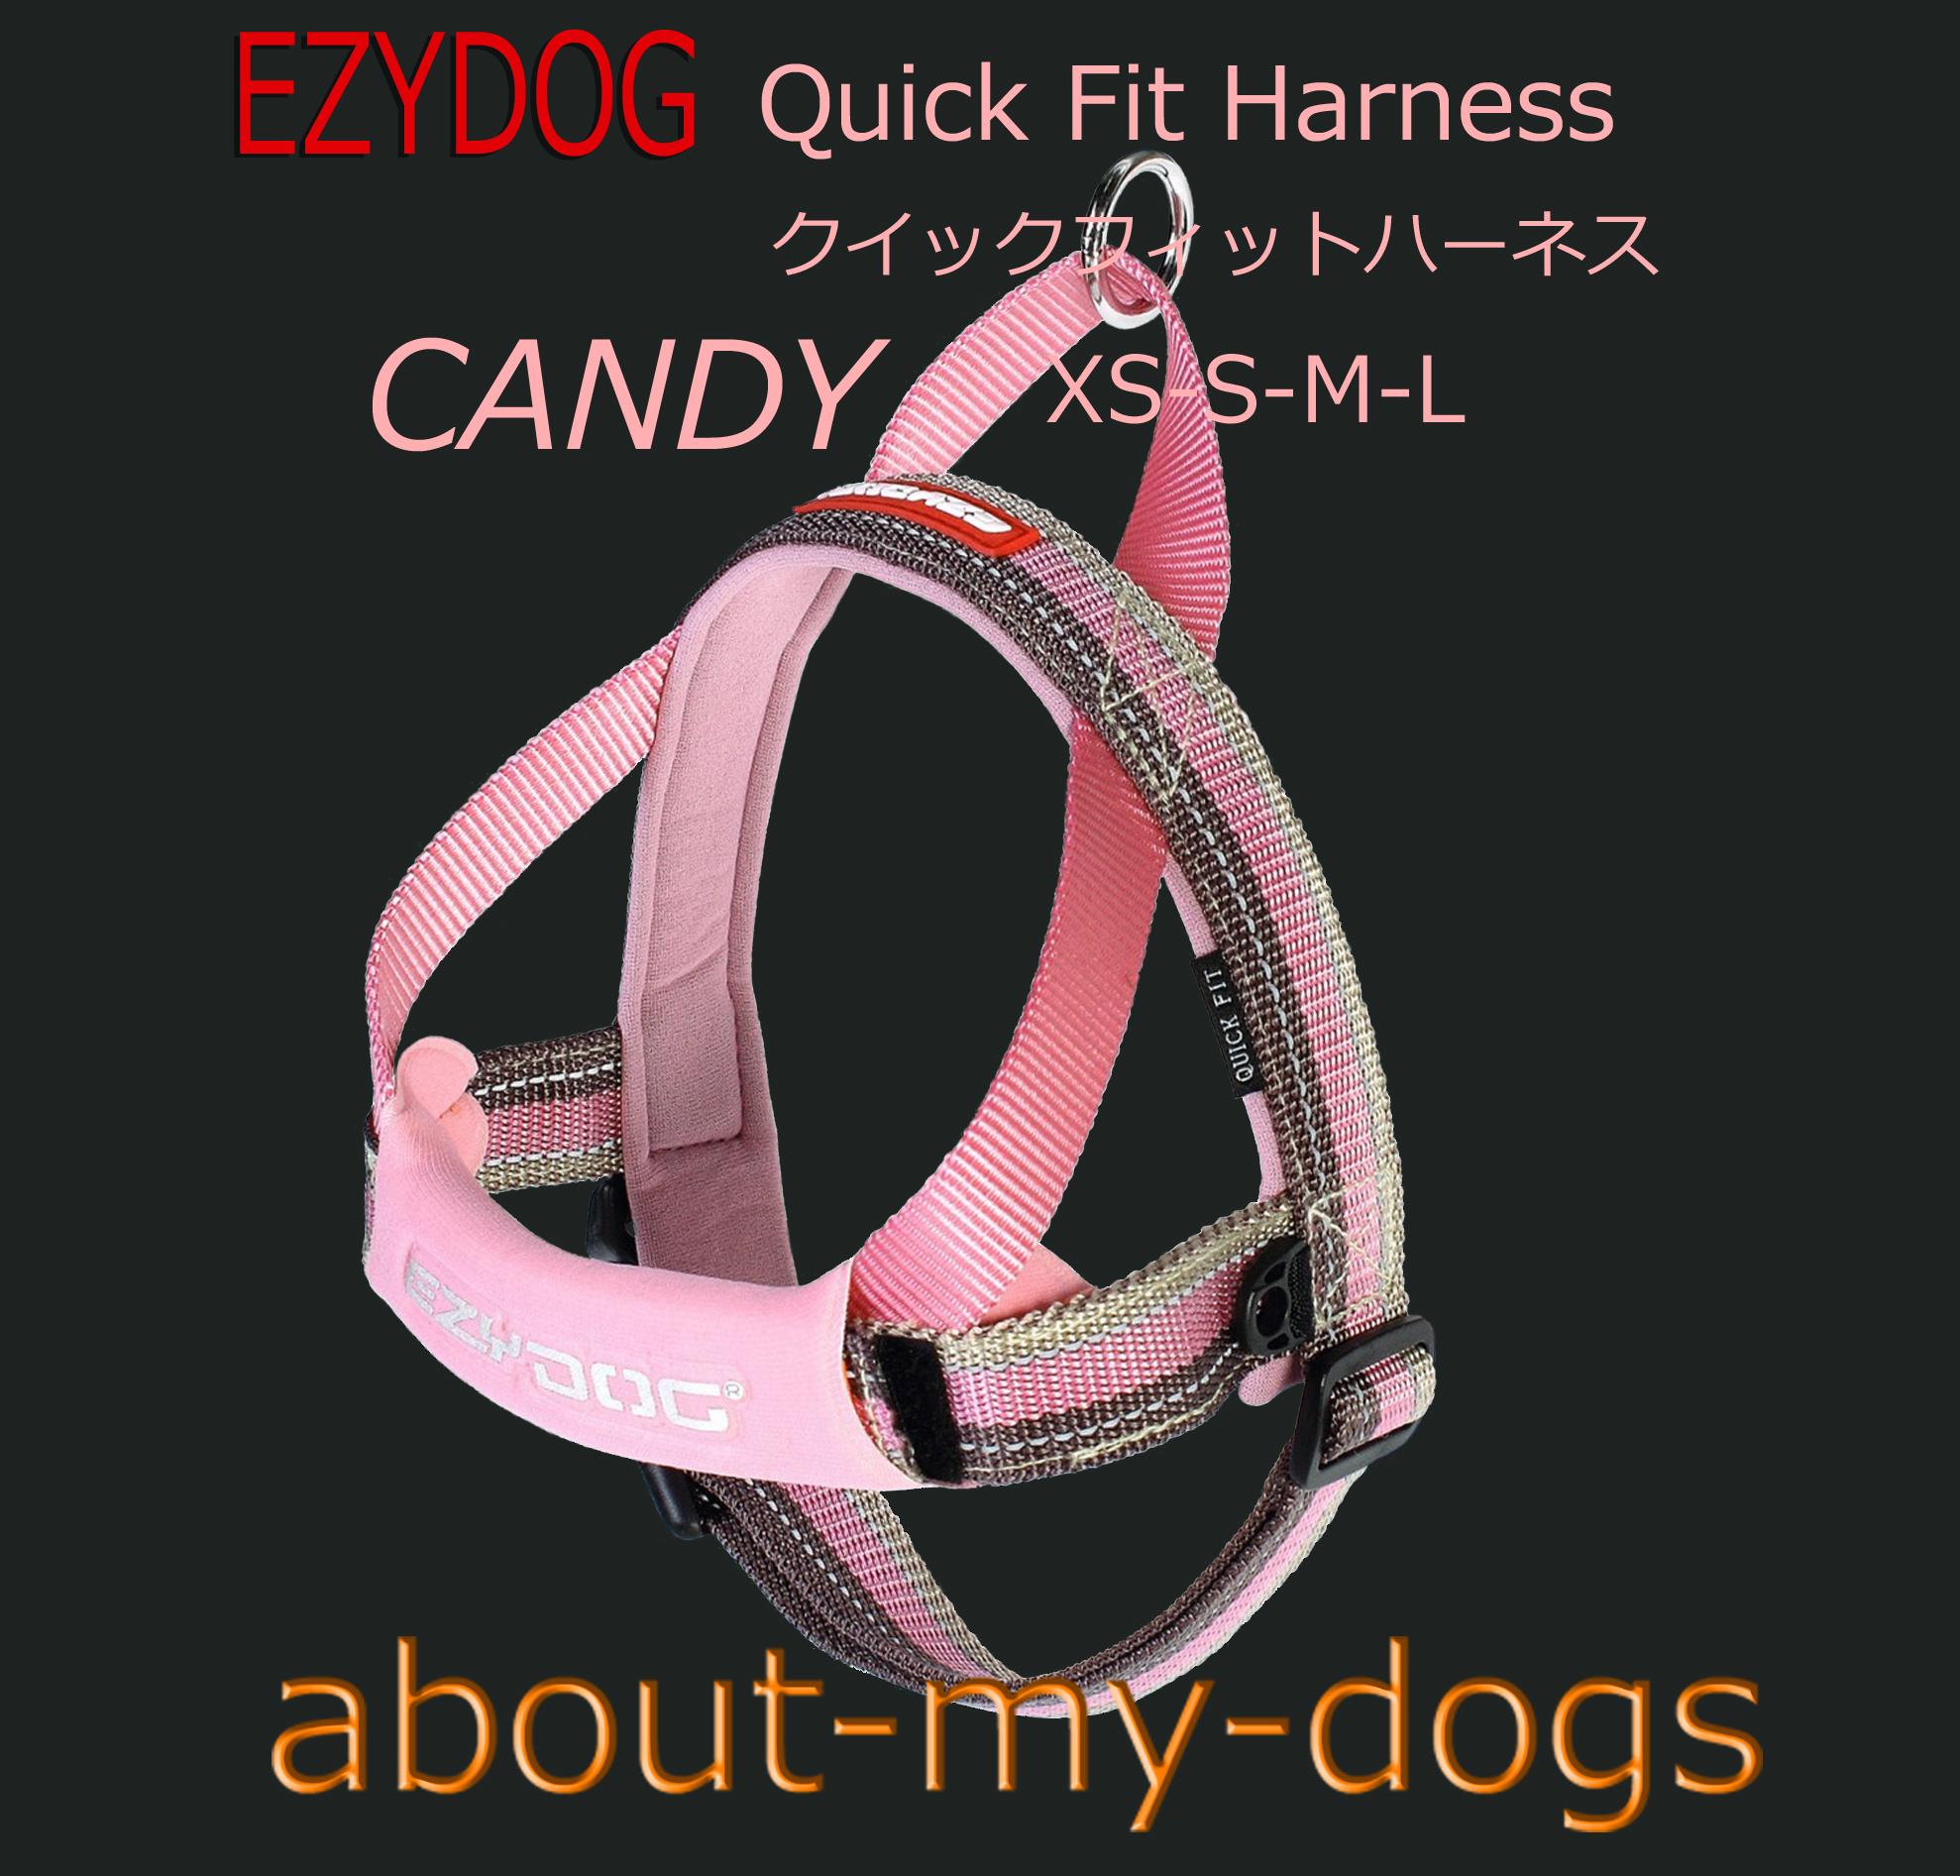 EZYDOG CANDYクイックフィットハーネスXS-SM-L